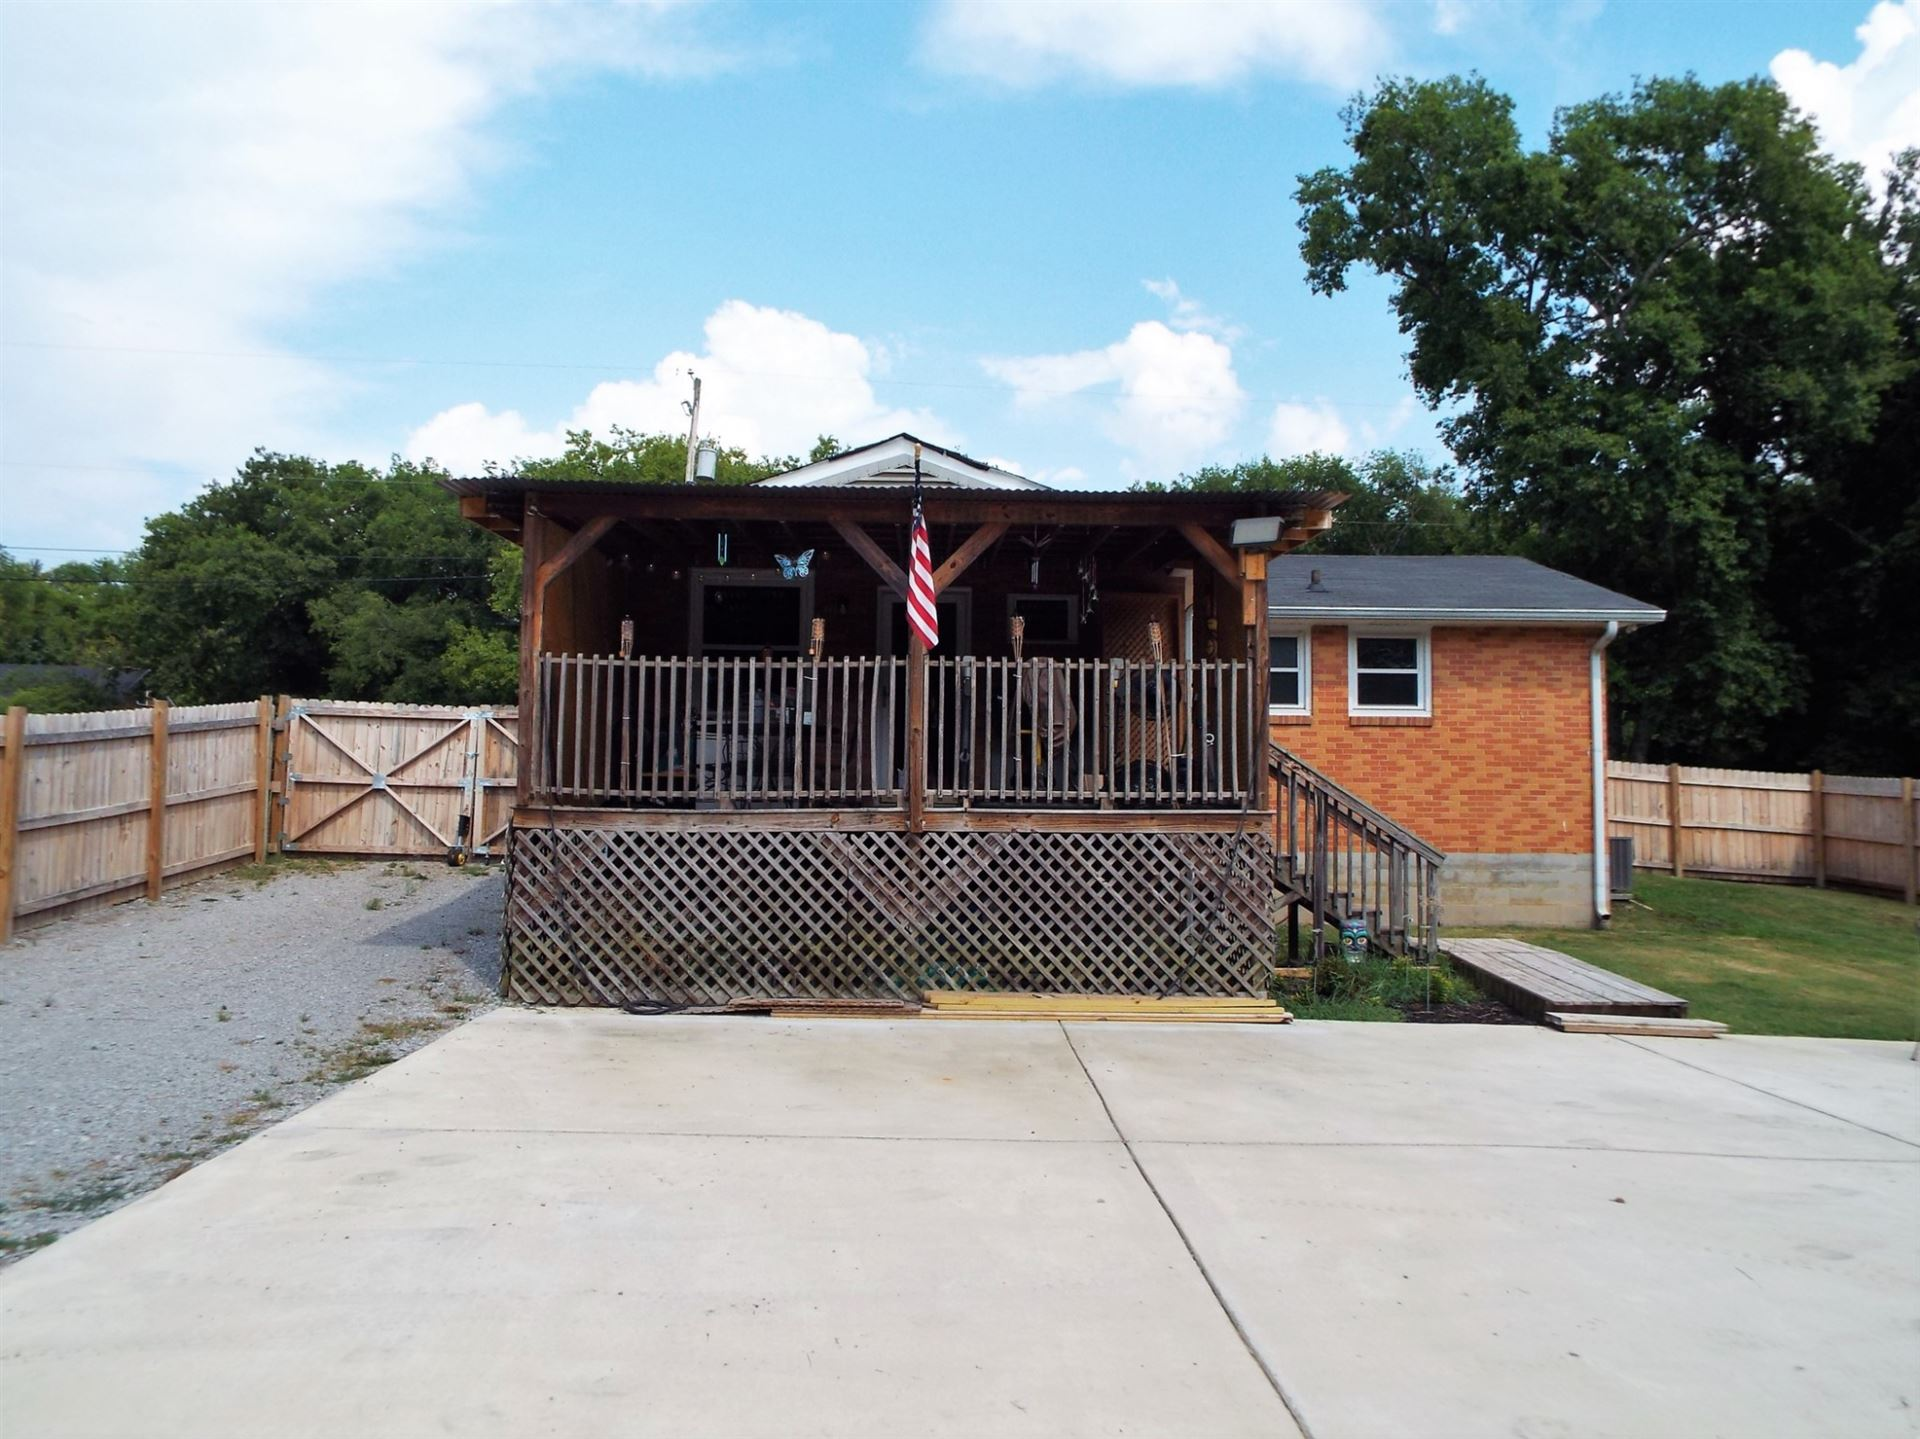 Photo of 4017 Meadow Rd, Nashville, TN 37218 (MLS # 2276475)